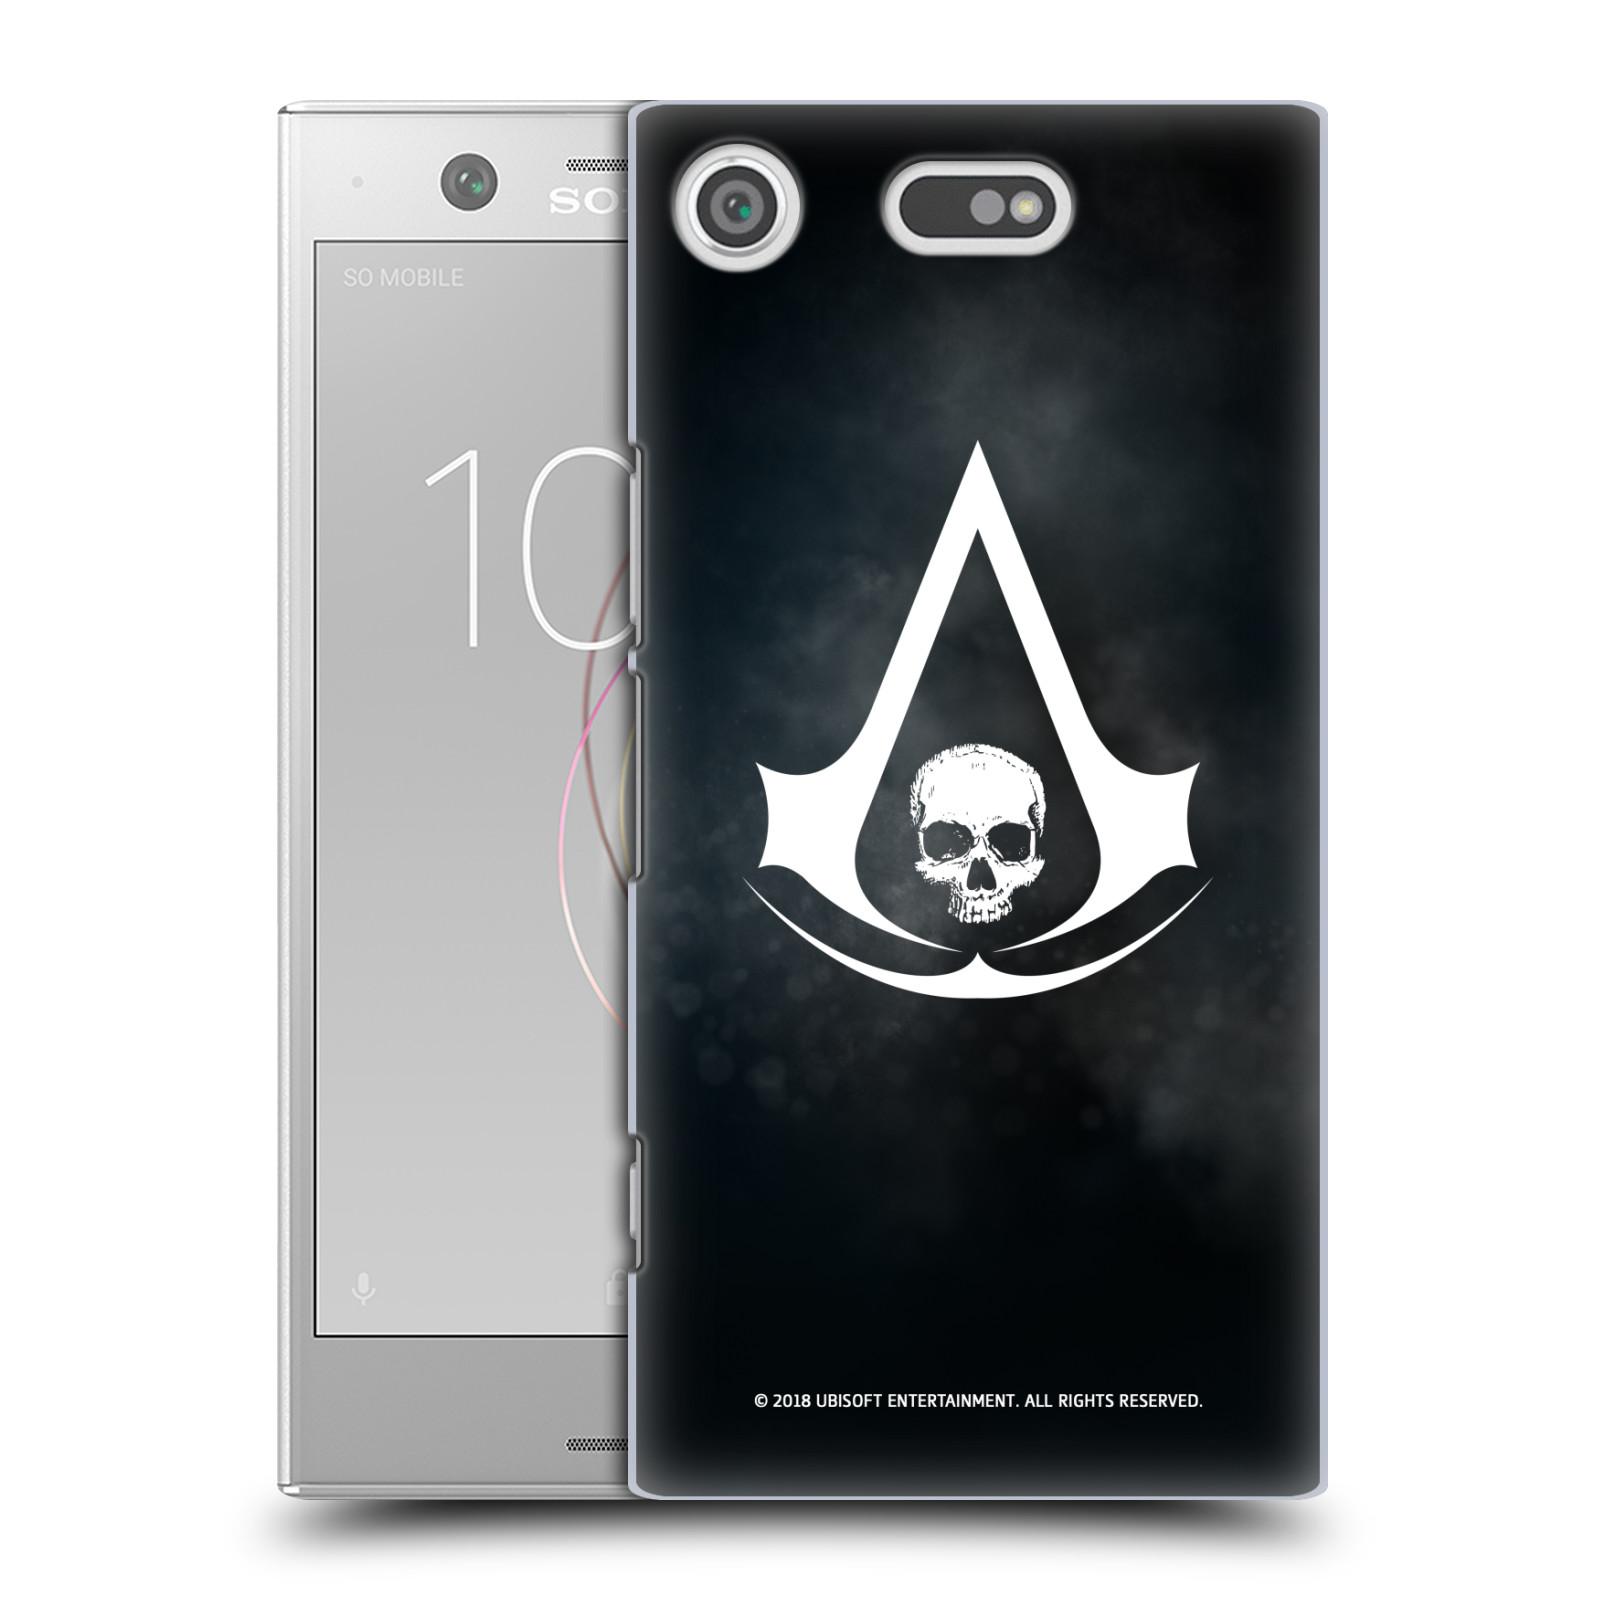 Pouzdro na mobil Sony Xperia XZ1 COMPACT - HEAD CASE - Assasins Creed Black Flag - Velký znak